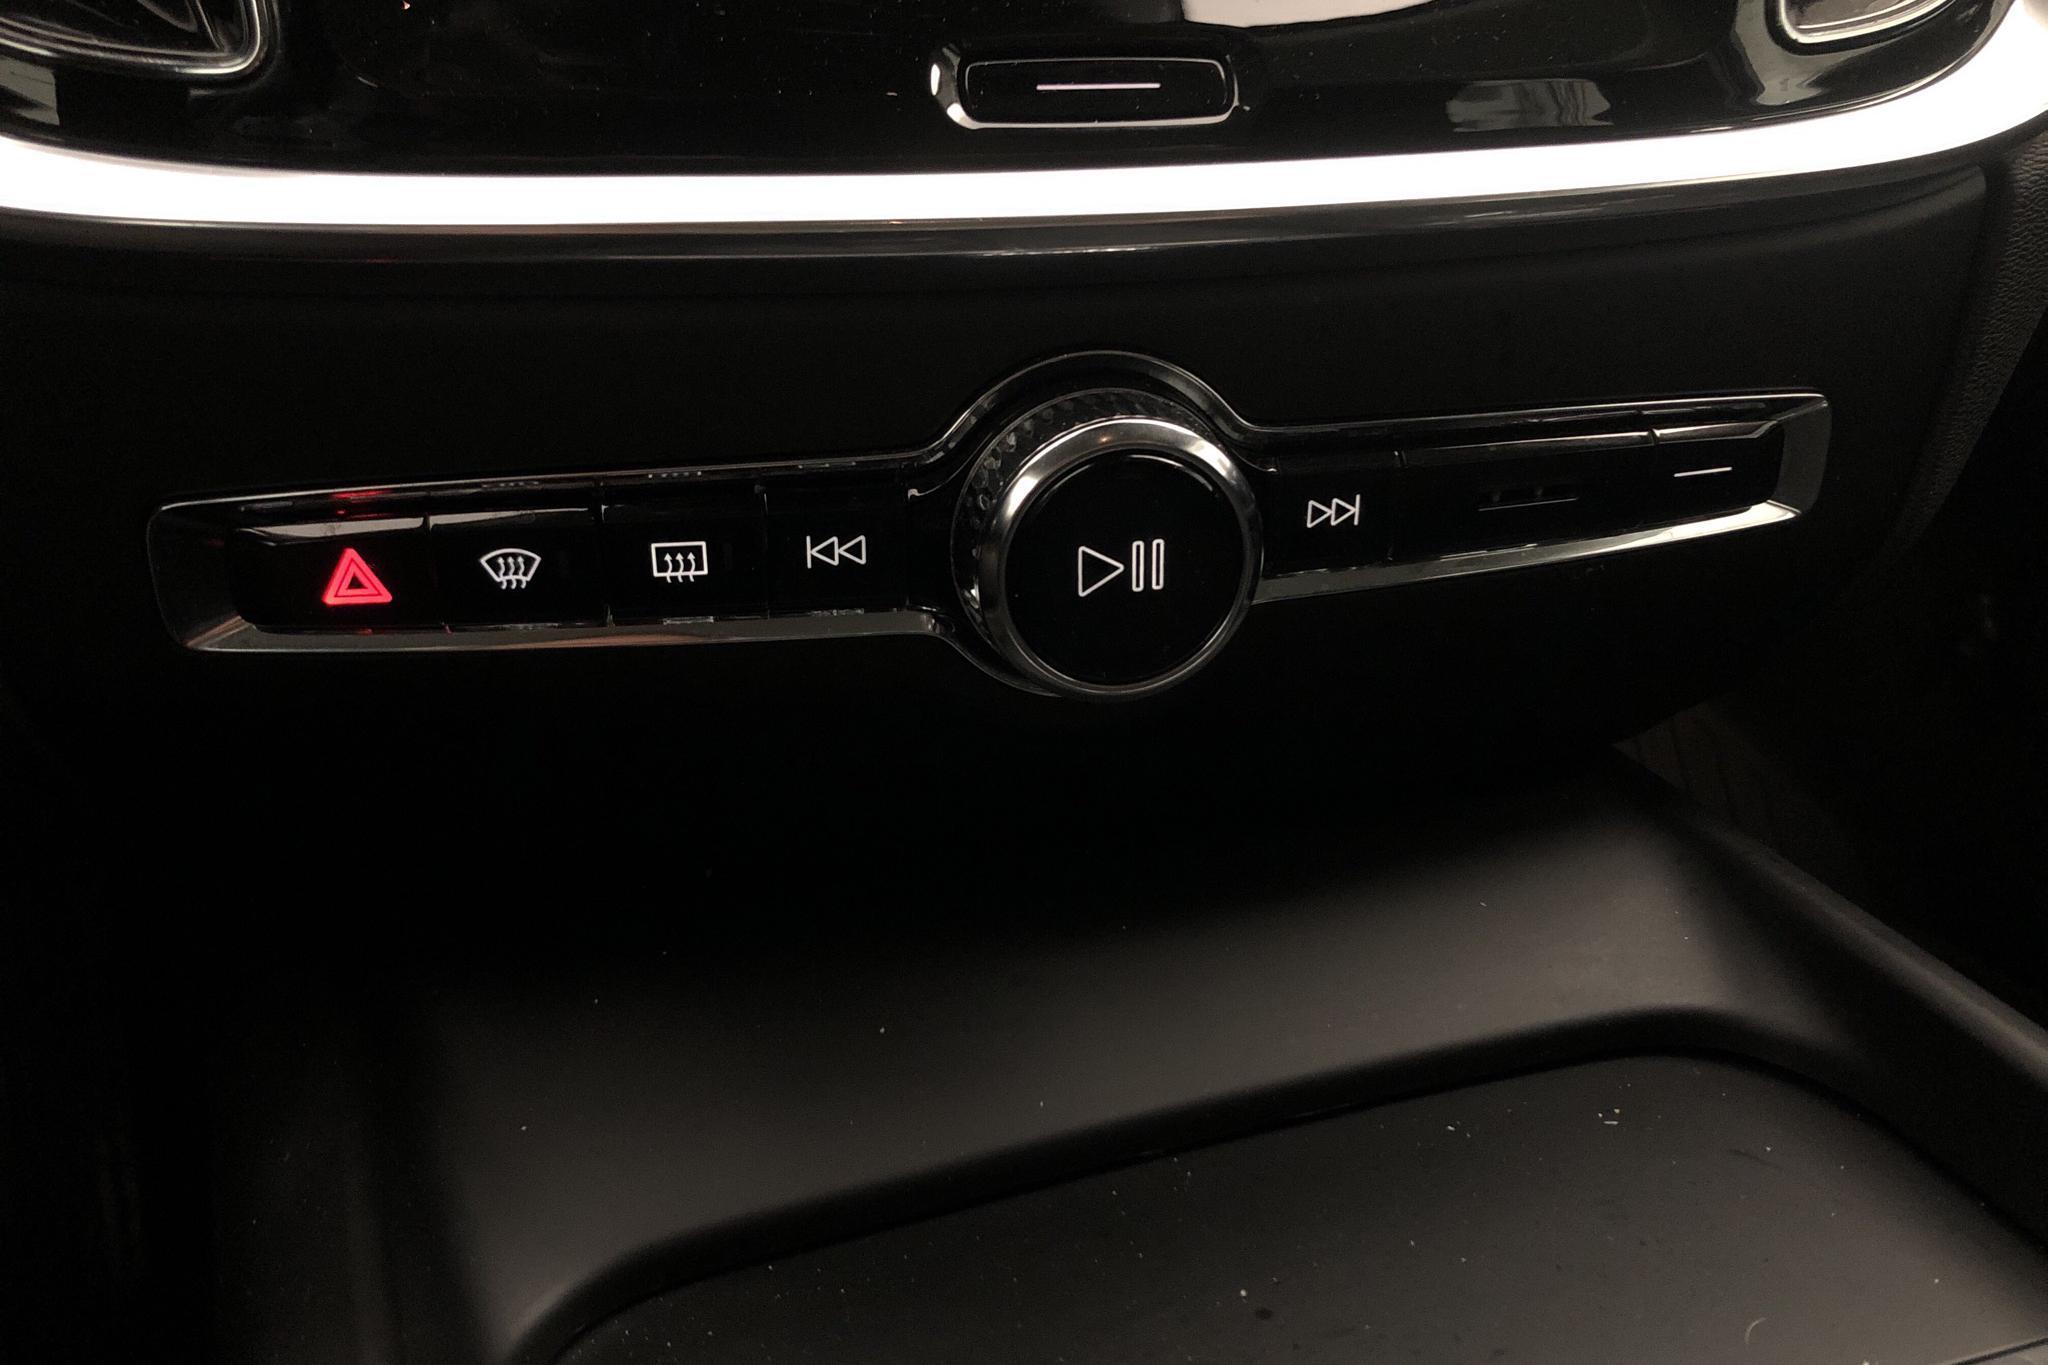 Volvo V60 D4 (190hk) - 96 460 km - Automatic - black - 2019